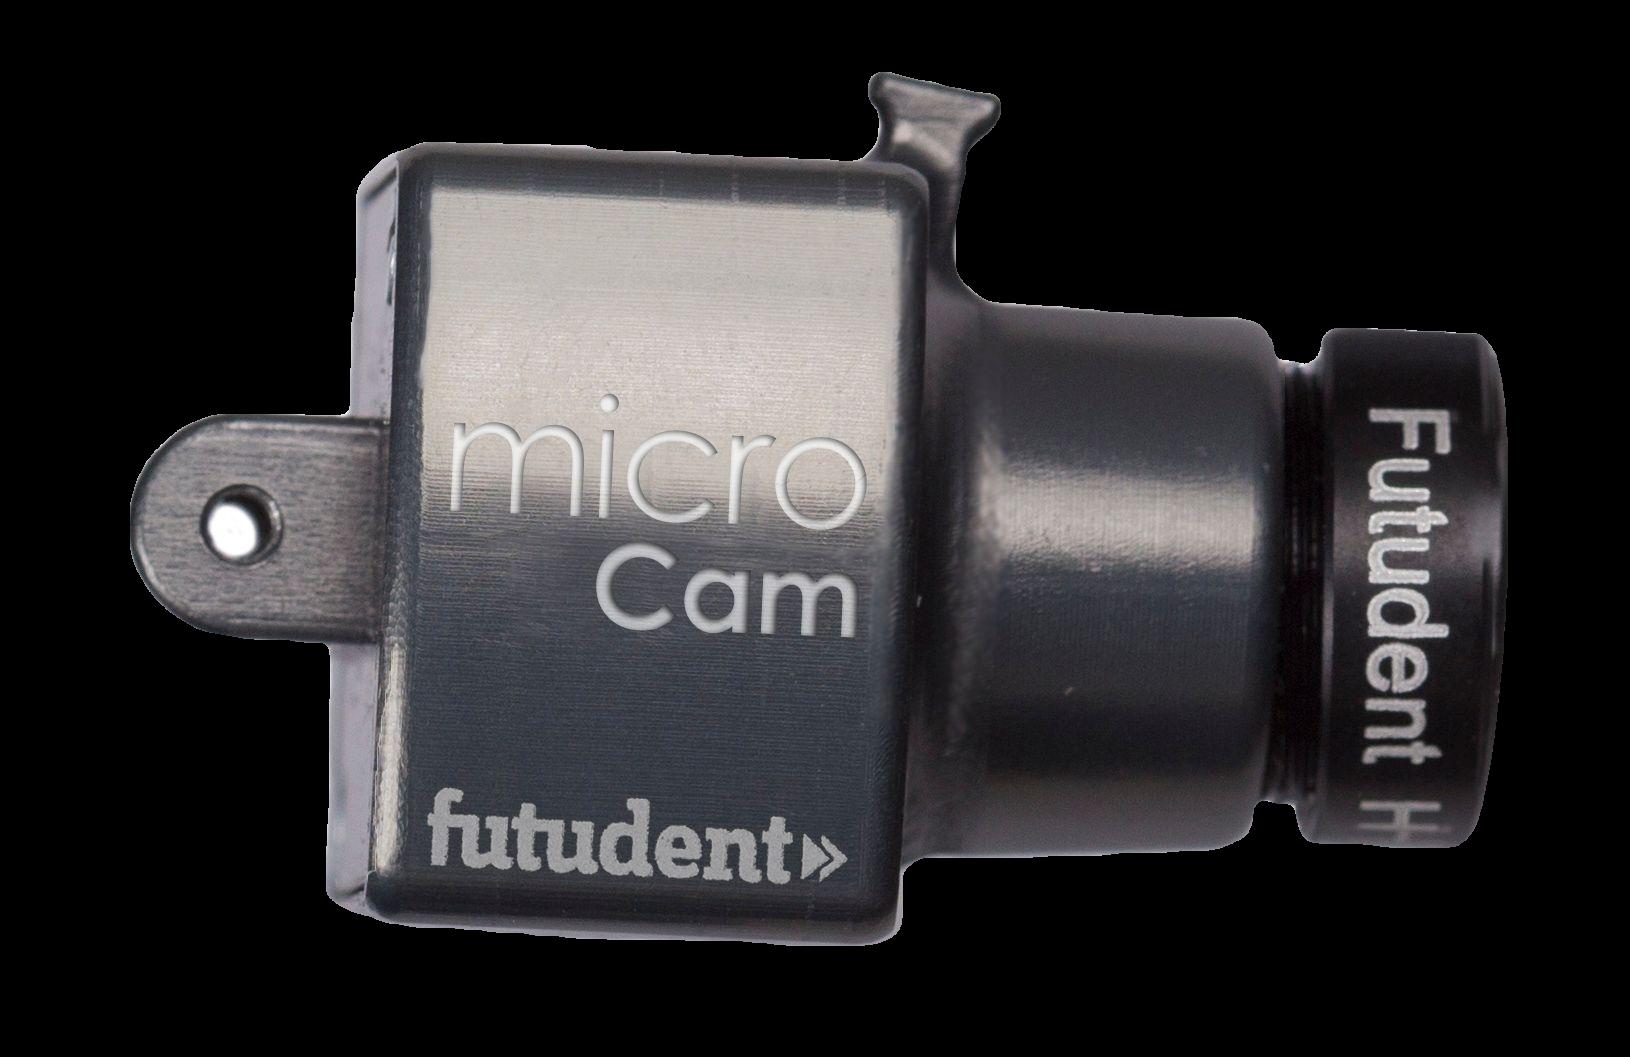 microcam